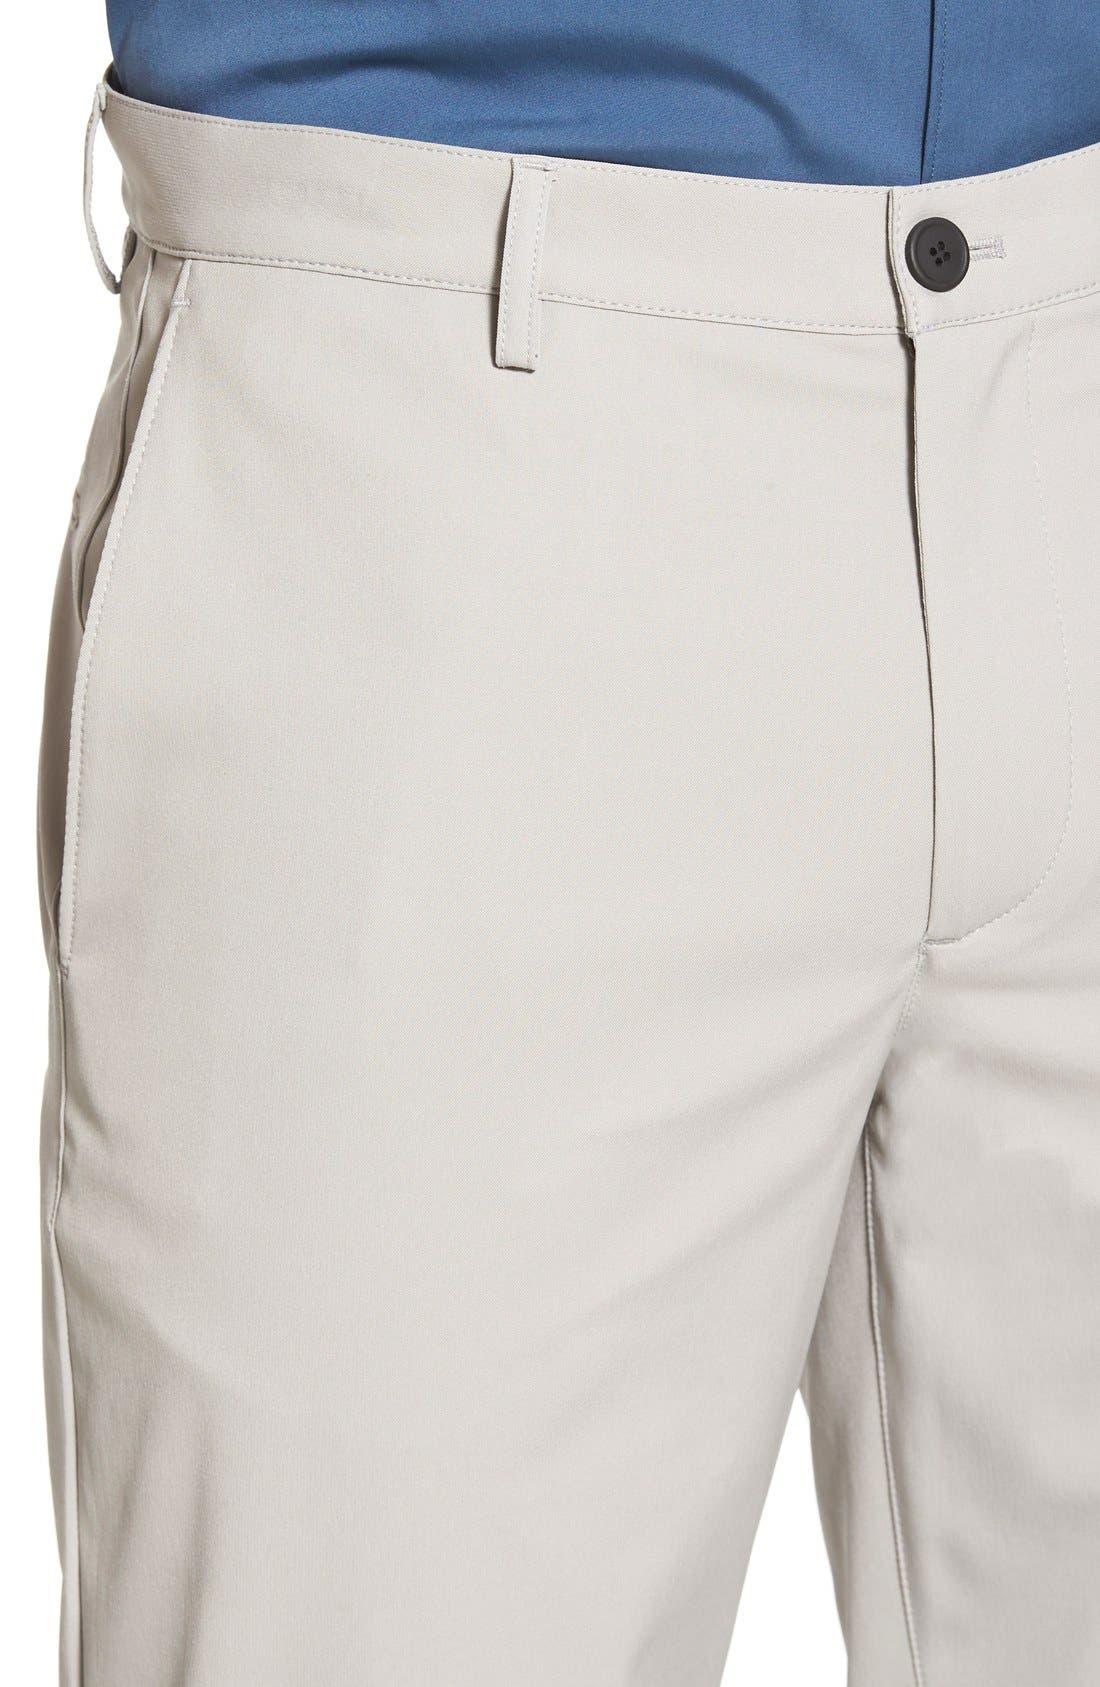 'Zaine Neoteric' Slim Fit Pants,                             Alternate thumbnail 4, color,                             Winter Sky